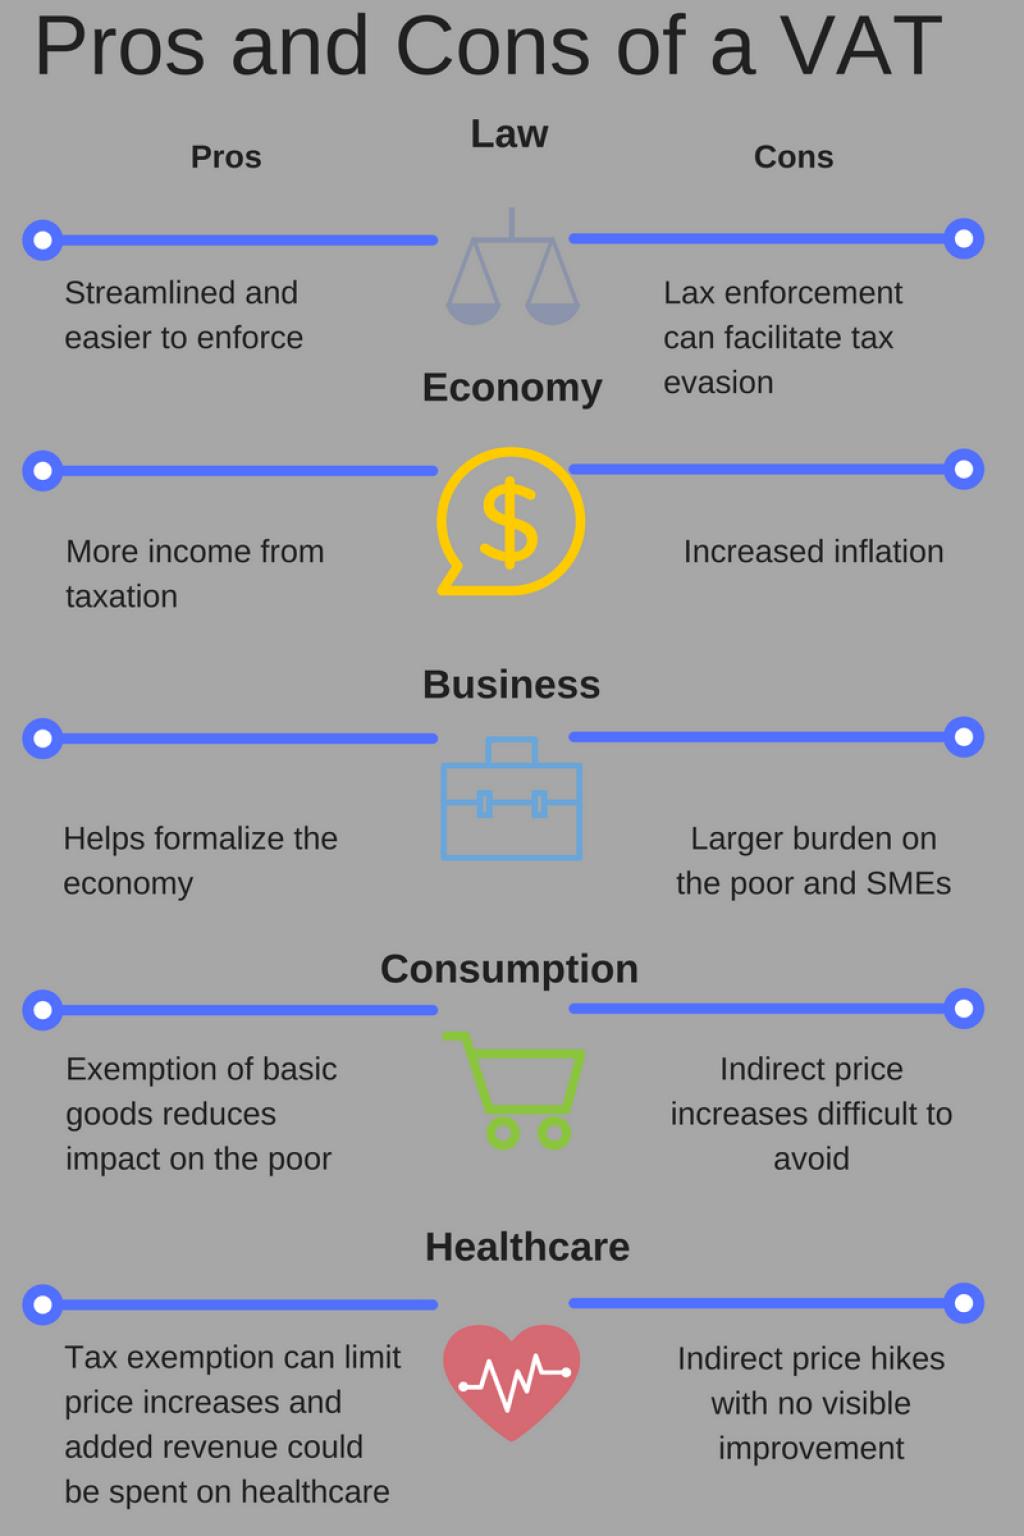 vat-infographic-2